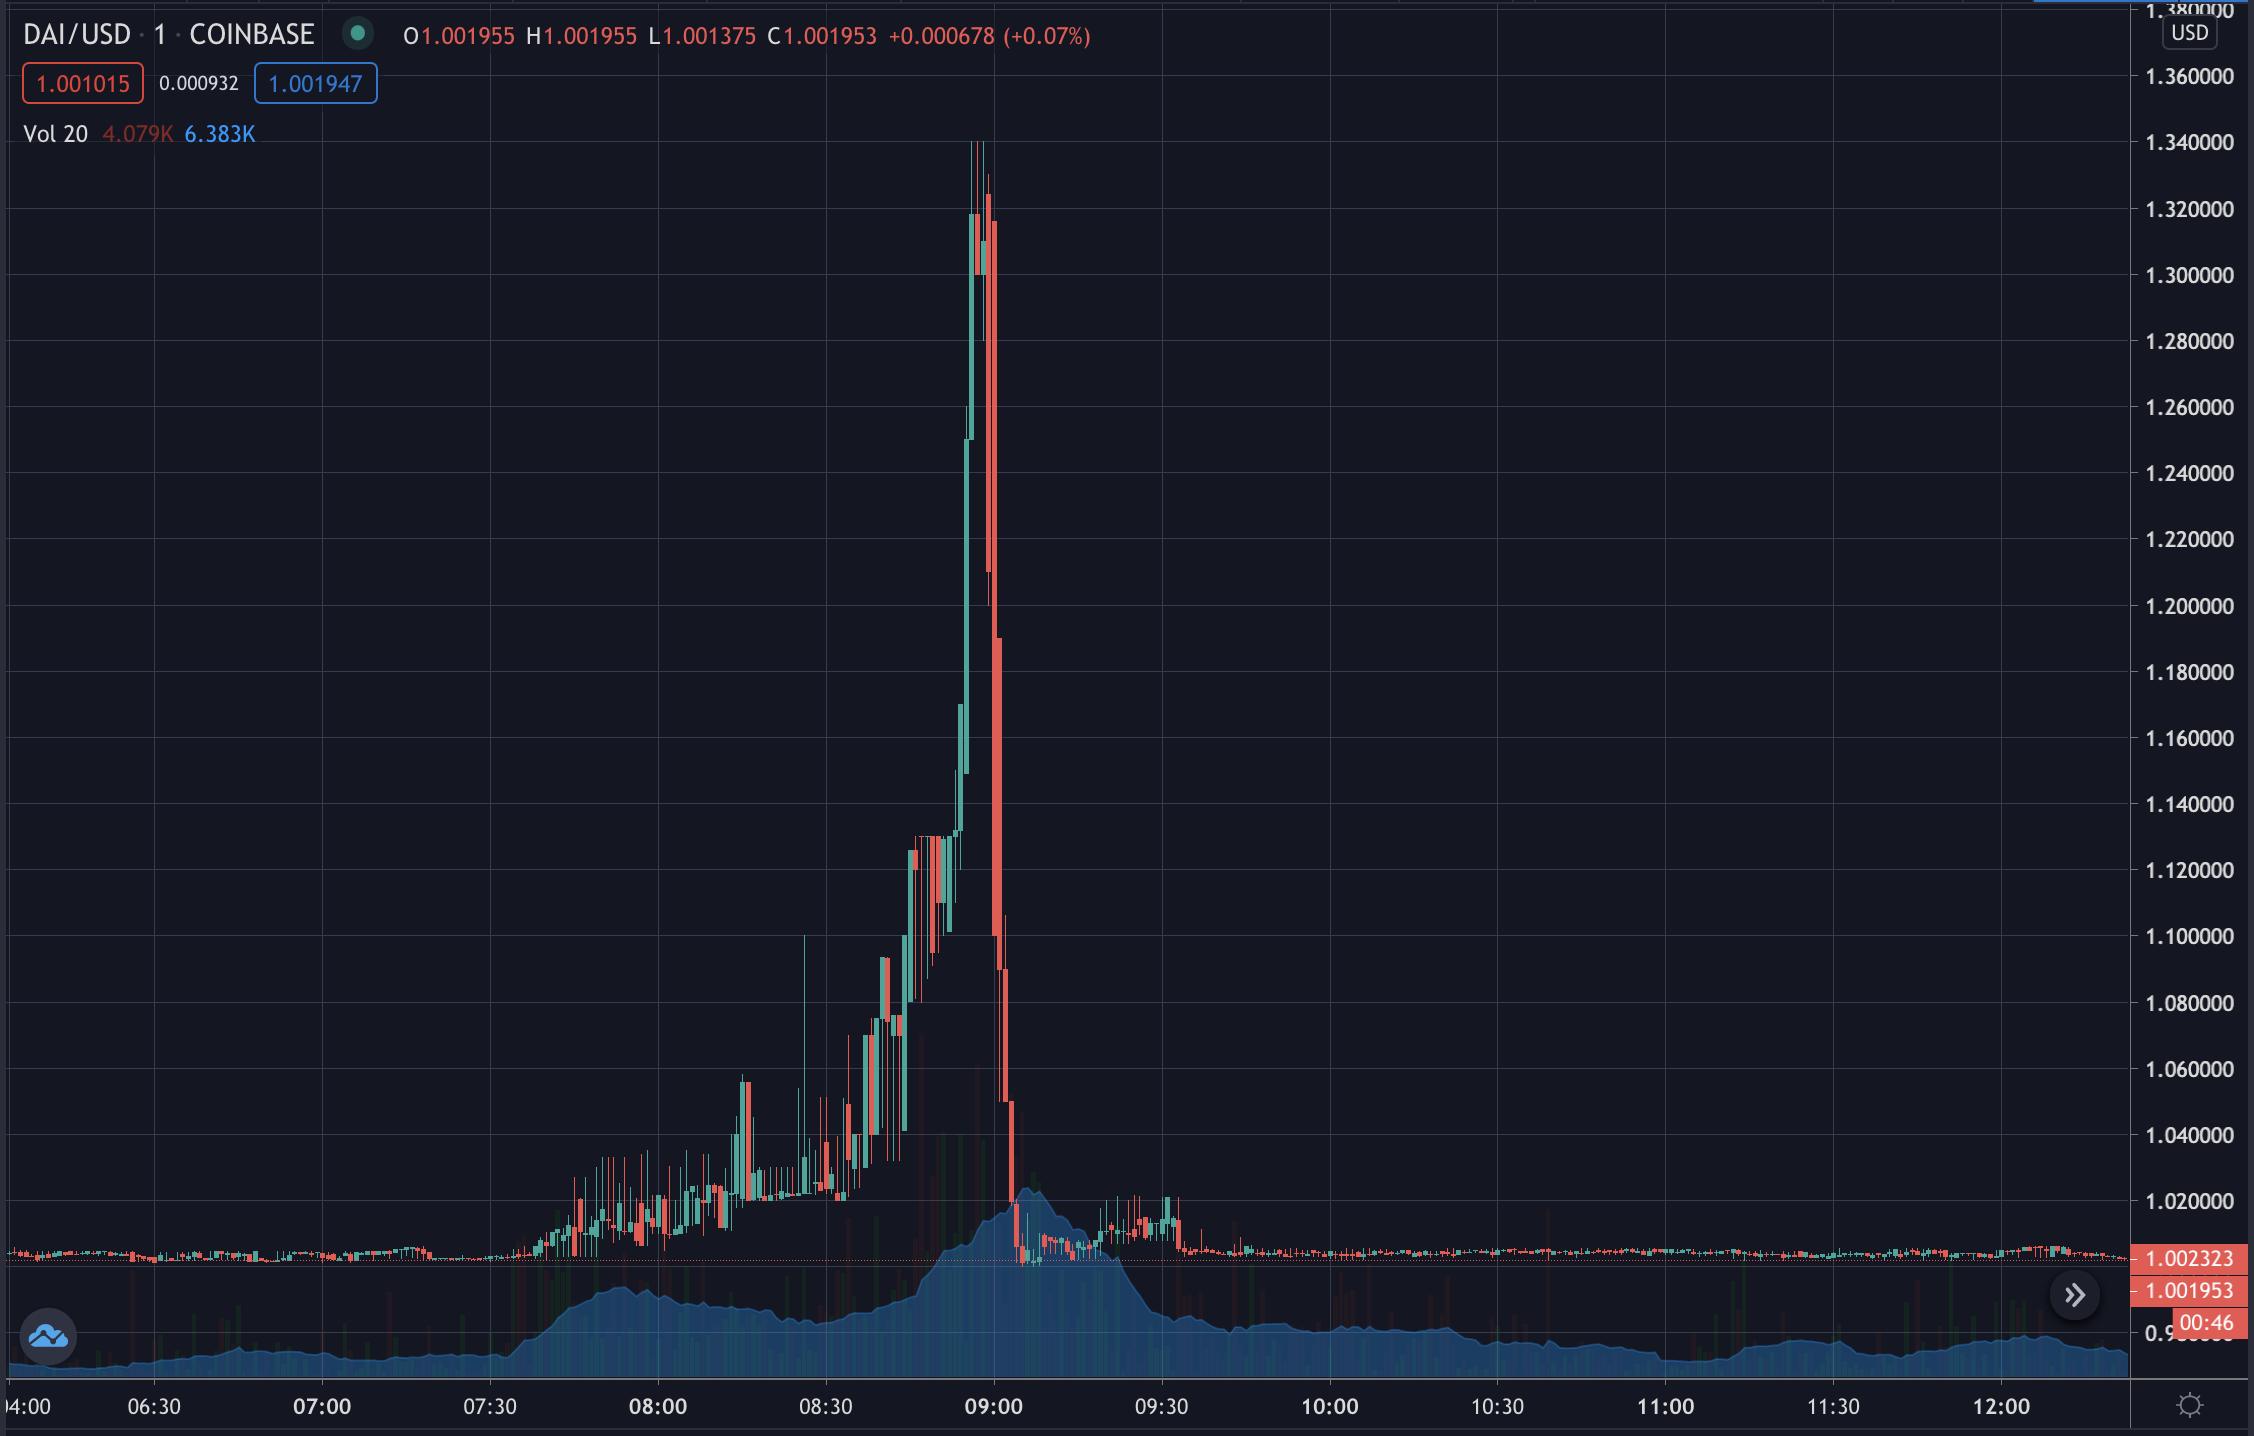 Dai goes off dollar peg on Coinbase, Nov 2020